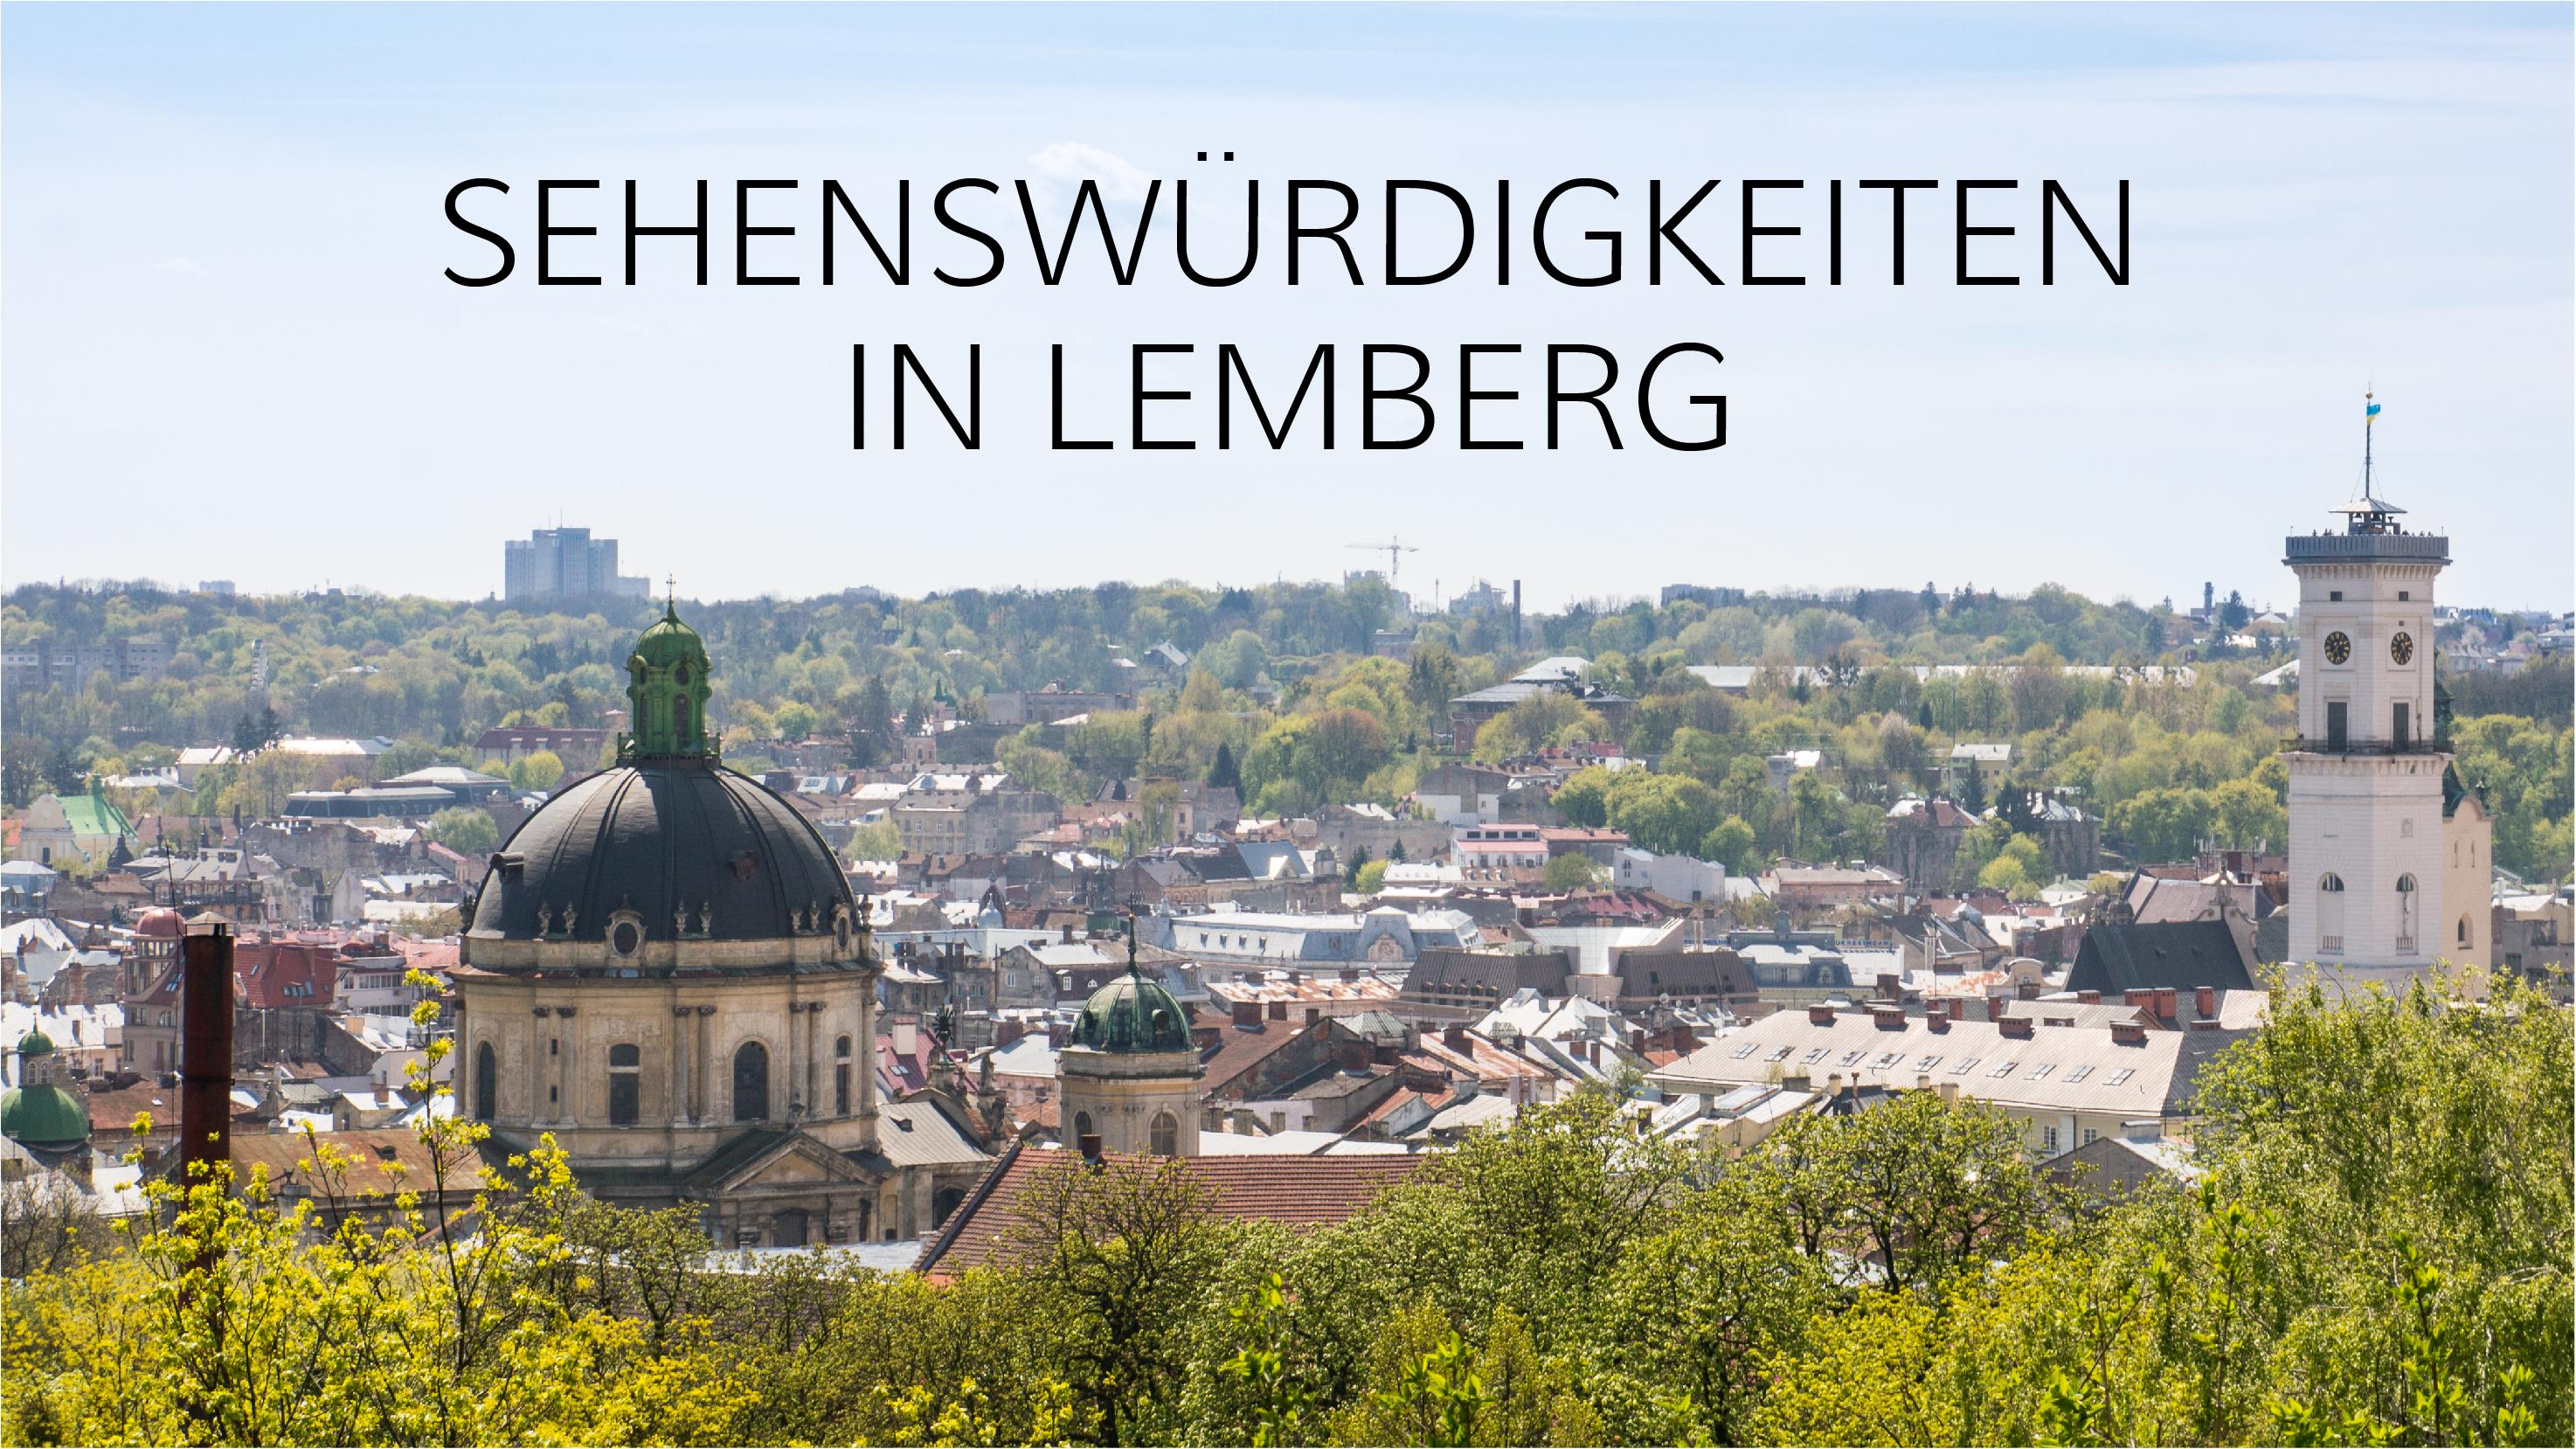 Dinge, die tun in Lemberg tun solltest